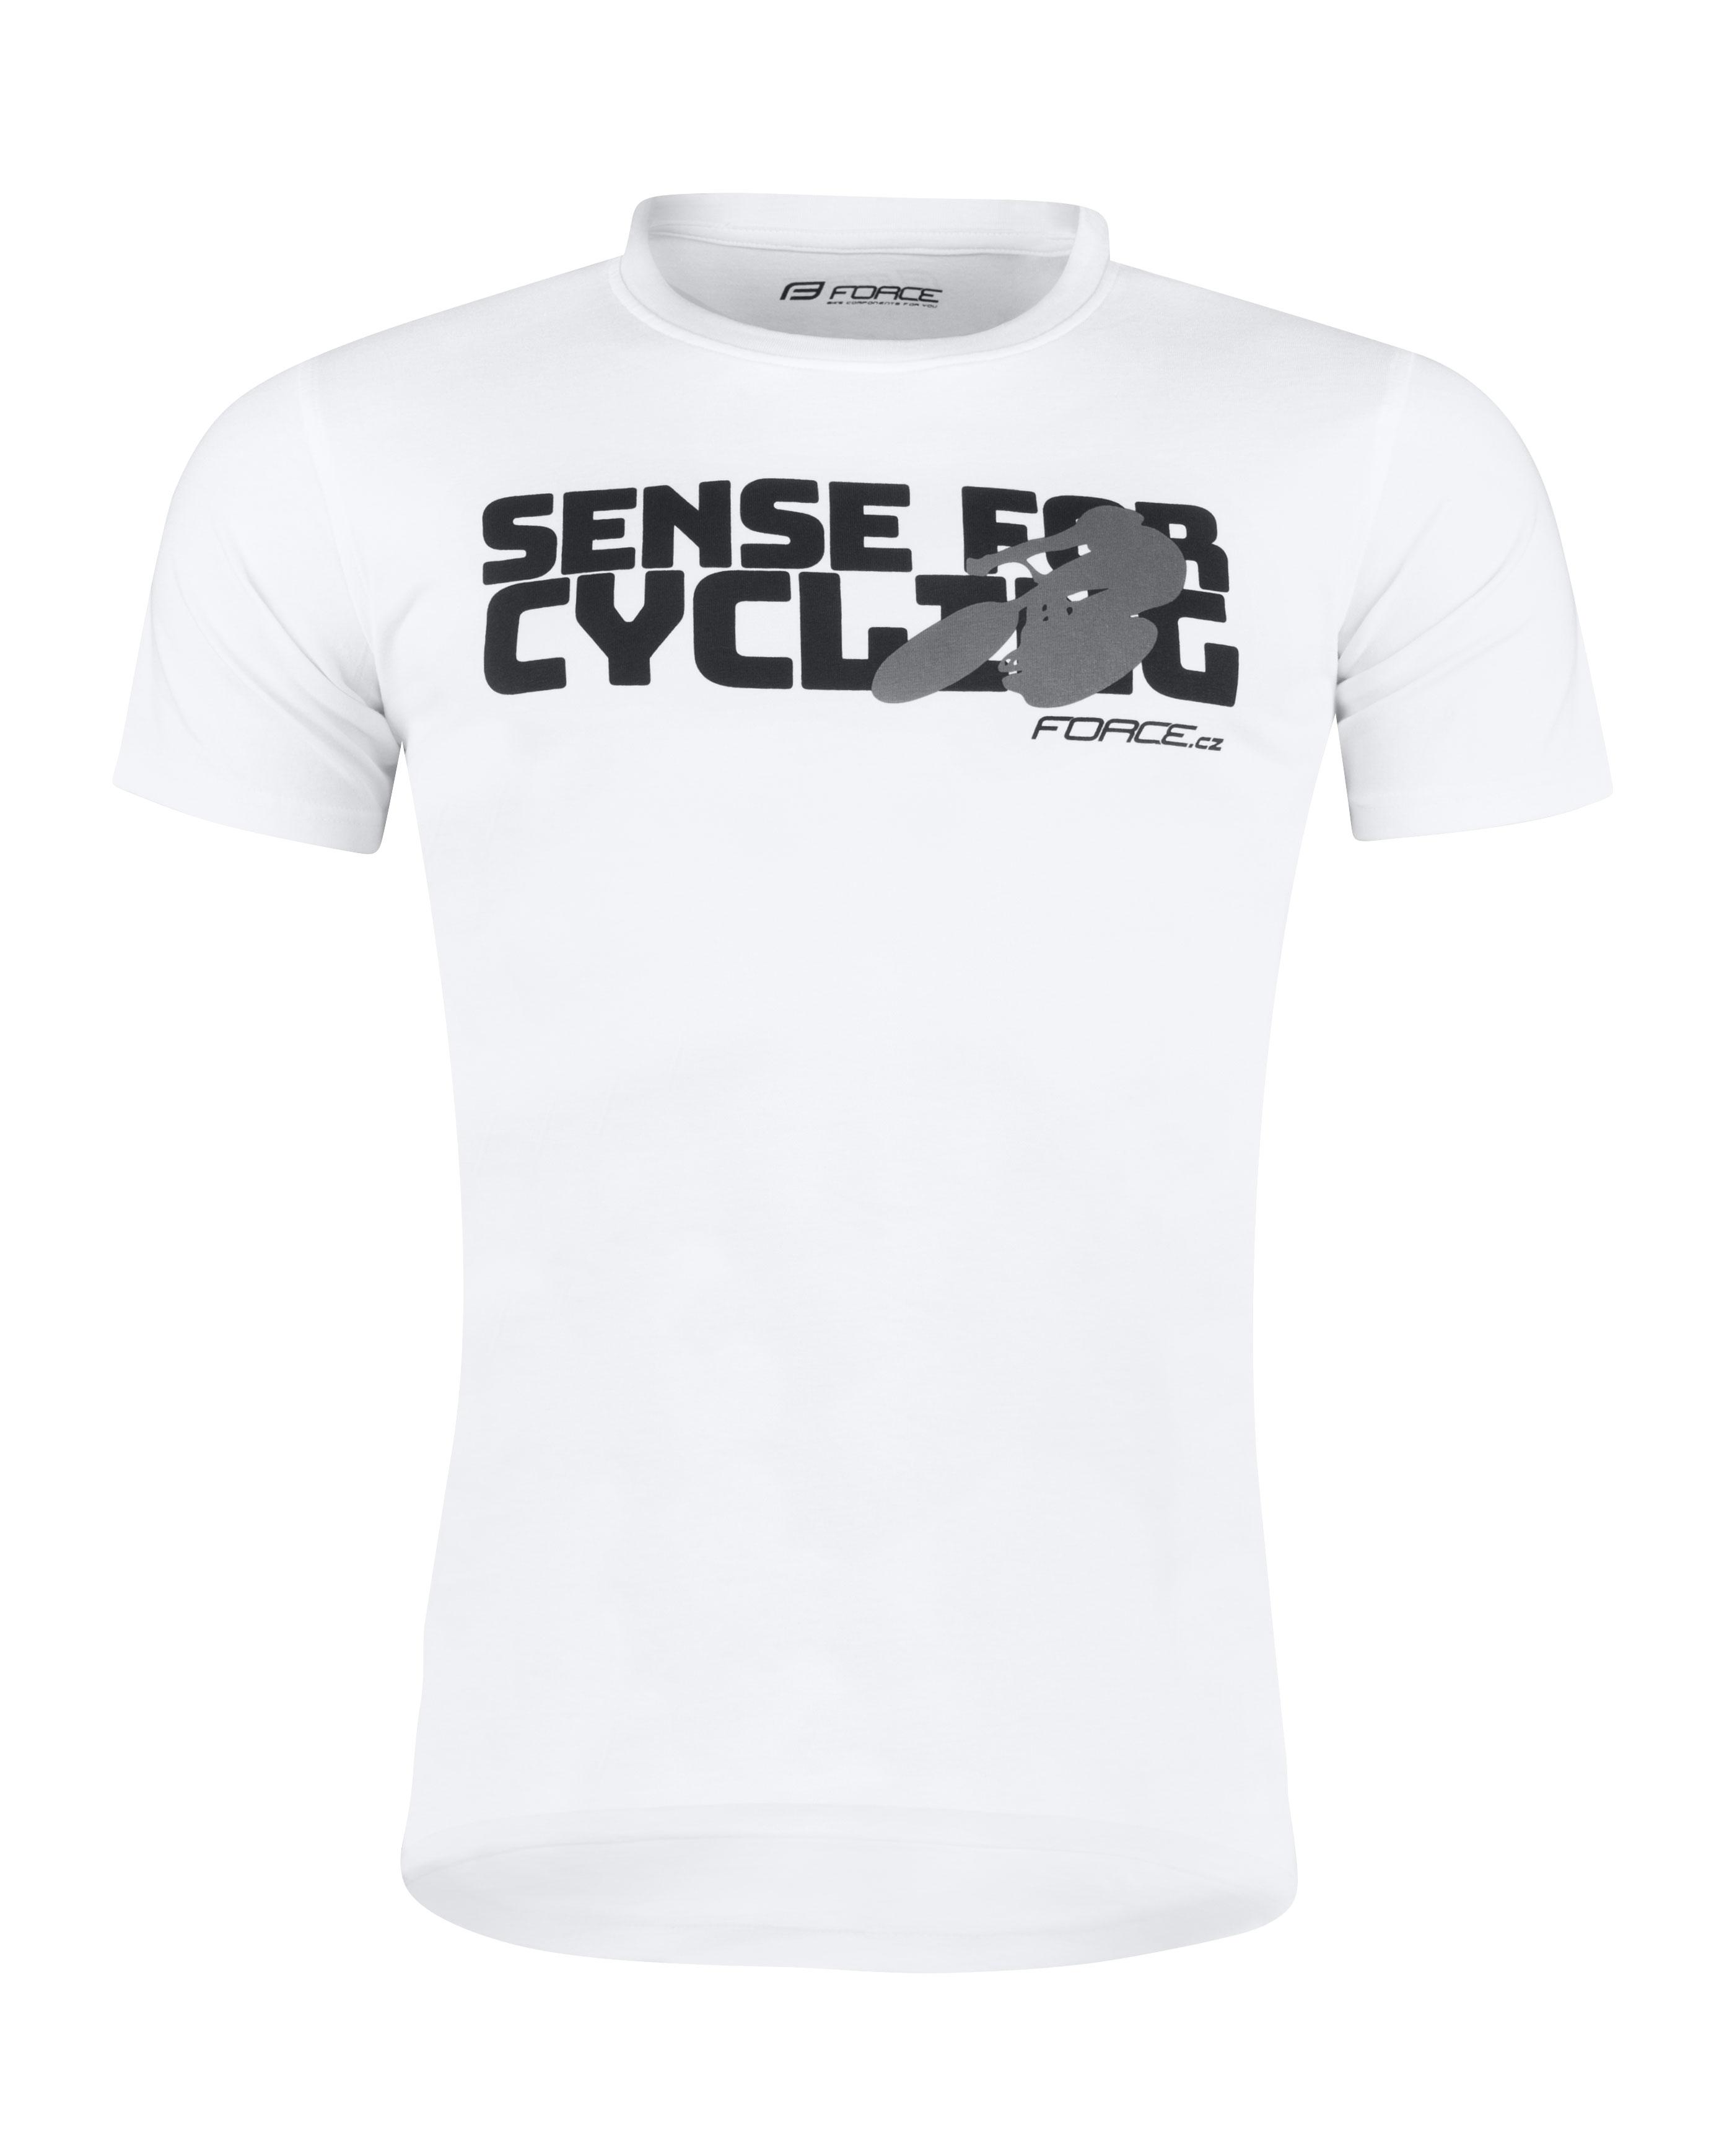 triko FORCE SENSE krátký rukáv, bílé XL